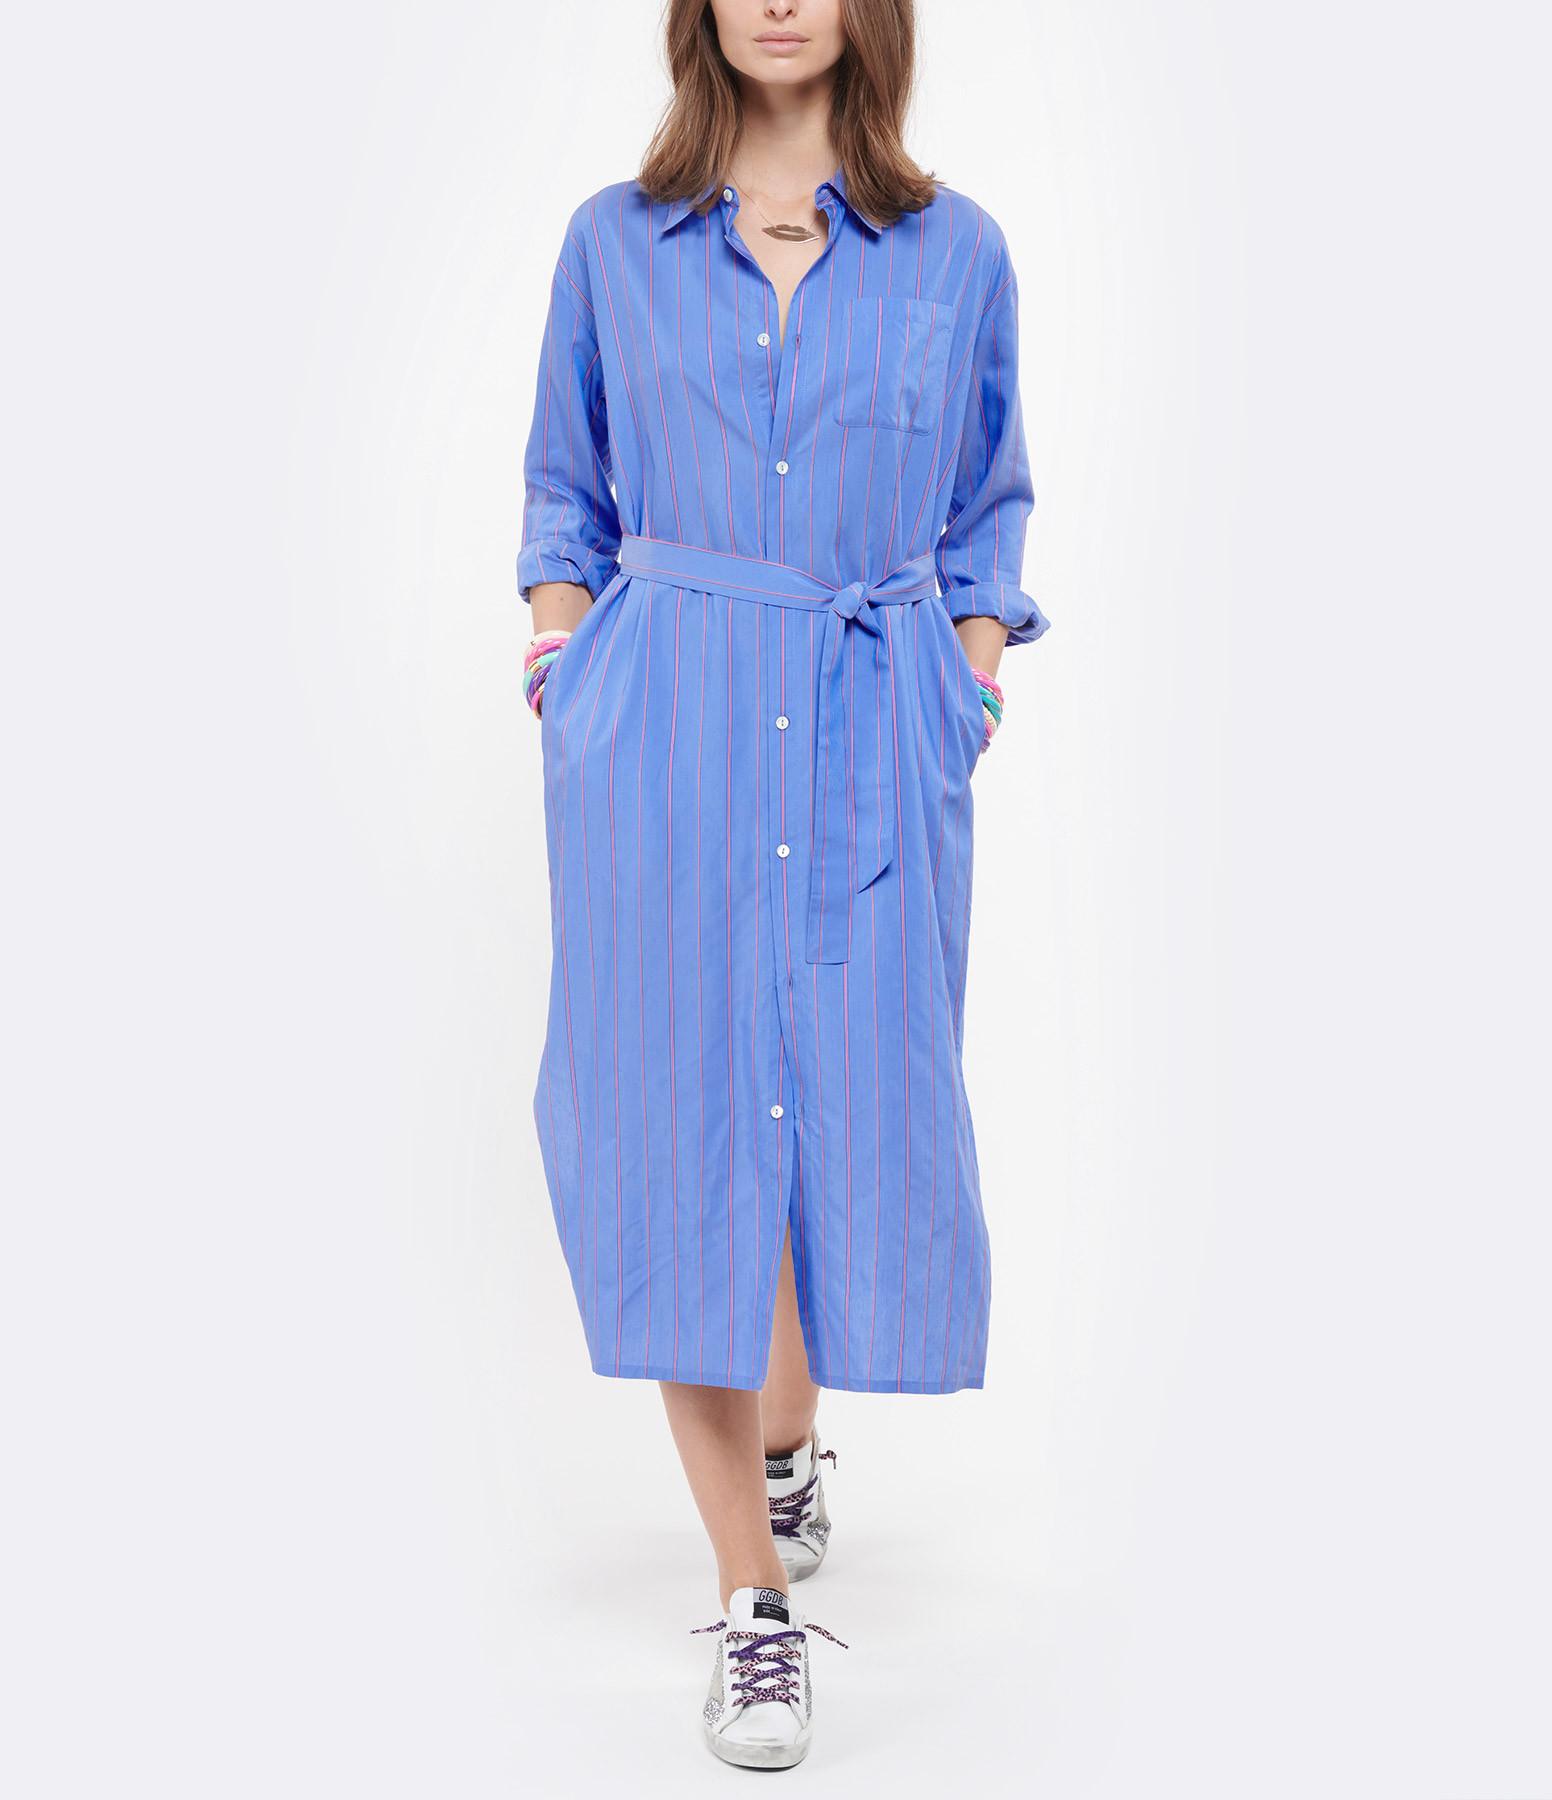 A.P.C. - Robe Hanna Rayures Bleu